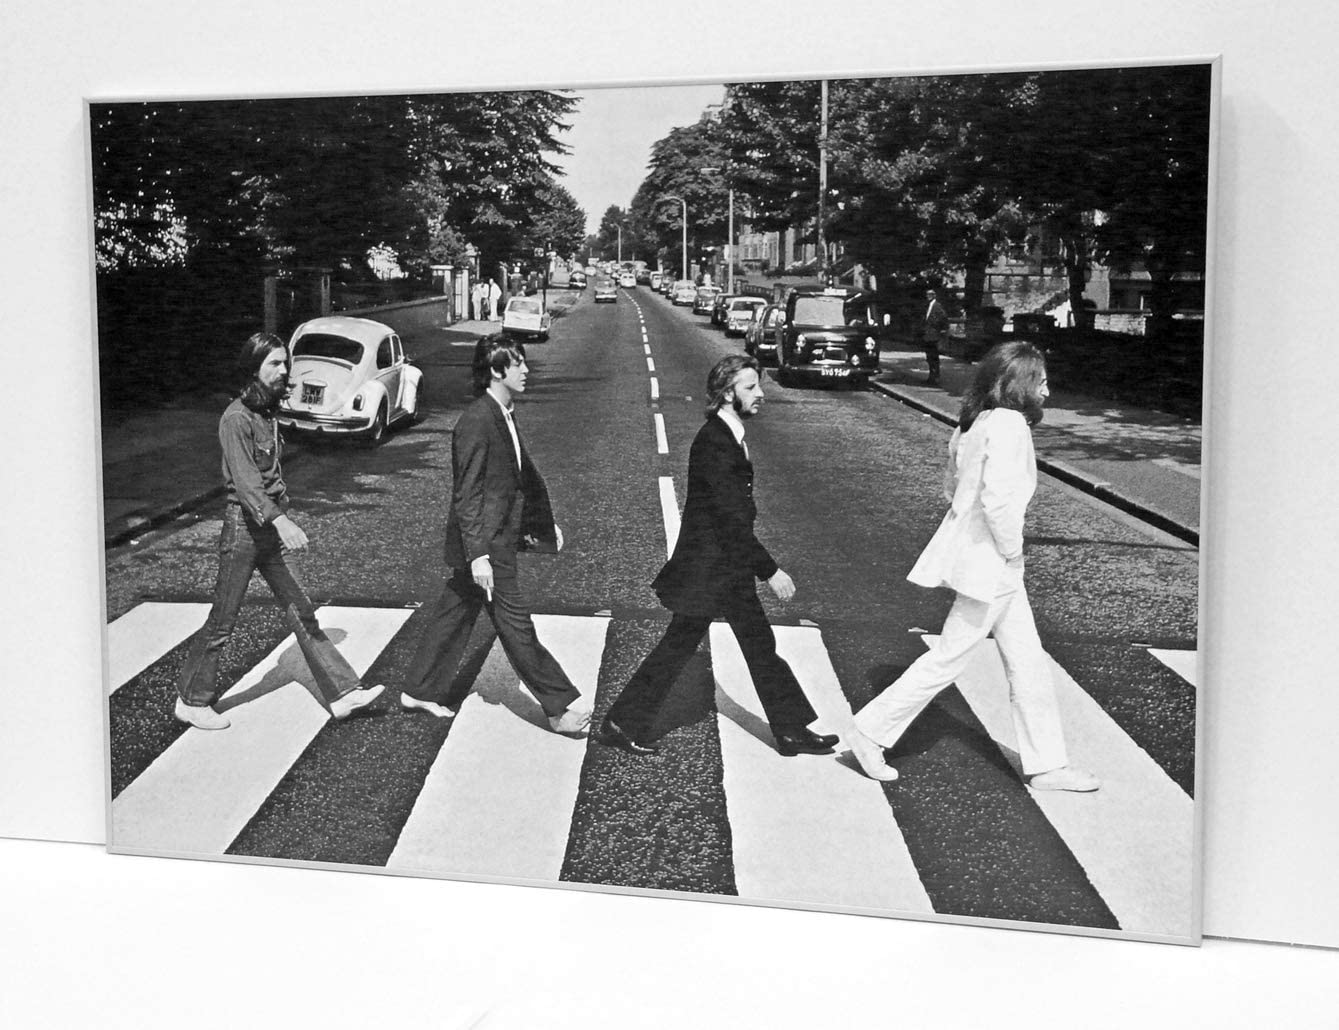 BaikalGallery Beatles Abbey Road Cuadro Enmarcado TAMAÑO 70X100cm (P1052) Moldura de Aluminio Mate Plata de 1,5cm - Montaje en Panel Adhesivo (Foam)- Laminado en Mate (Sin Cristal)